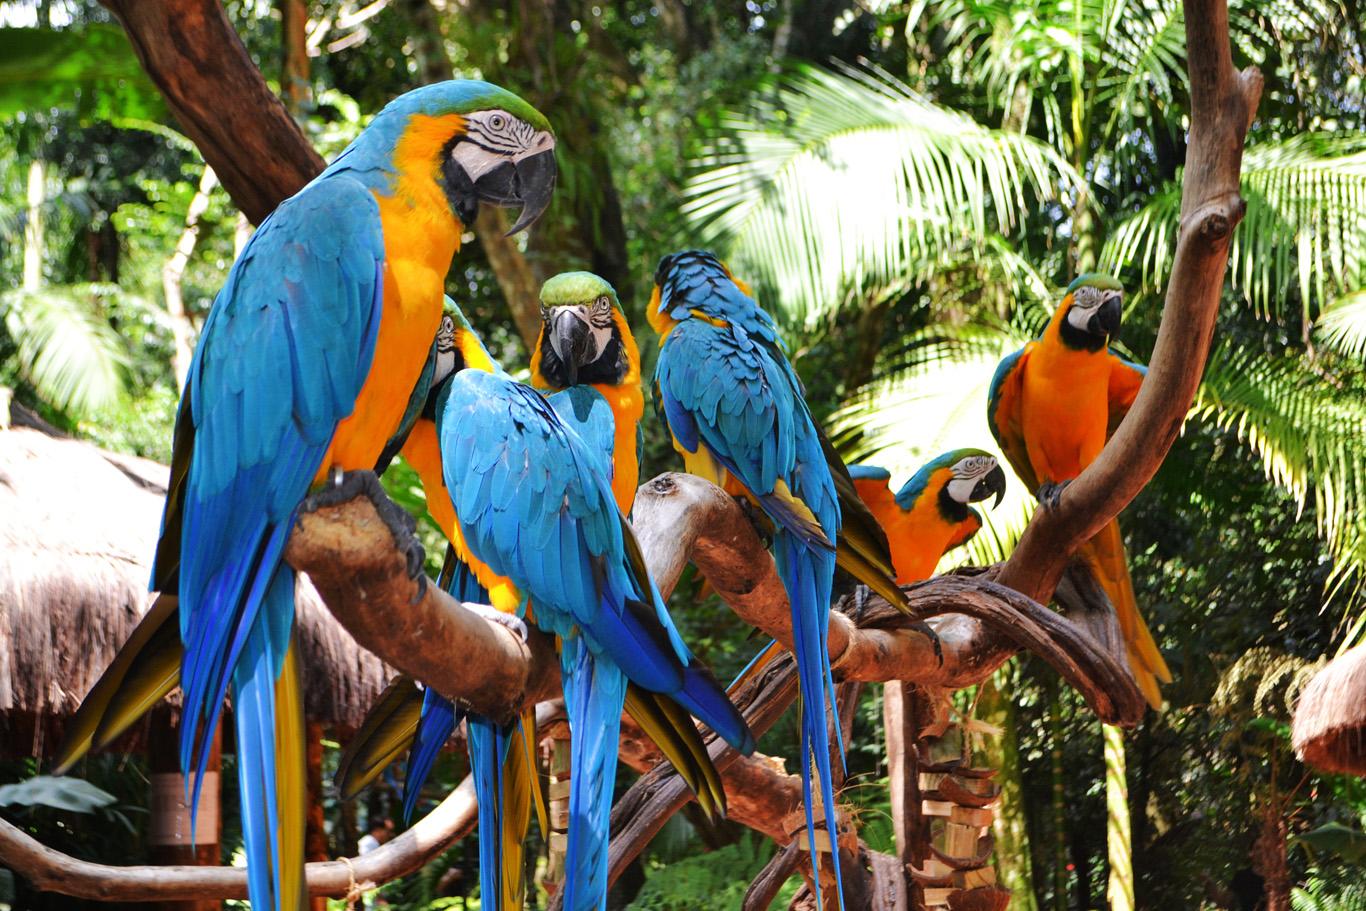 Bird Park in Iguassu Falls (Parque Das Aves, Foz do Iguacu), Brazil —  Adventurous Travels | Adventure Travel | Best Beaches | Off the Beaten Path  | Best Countries | Best Mountains Treks